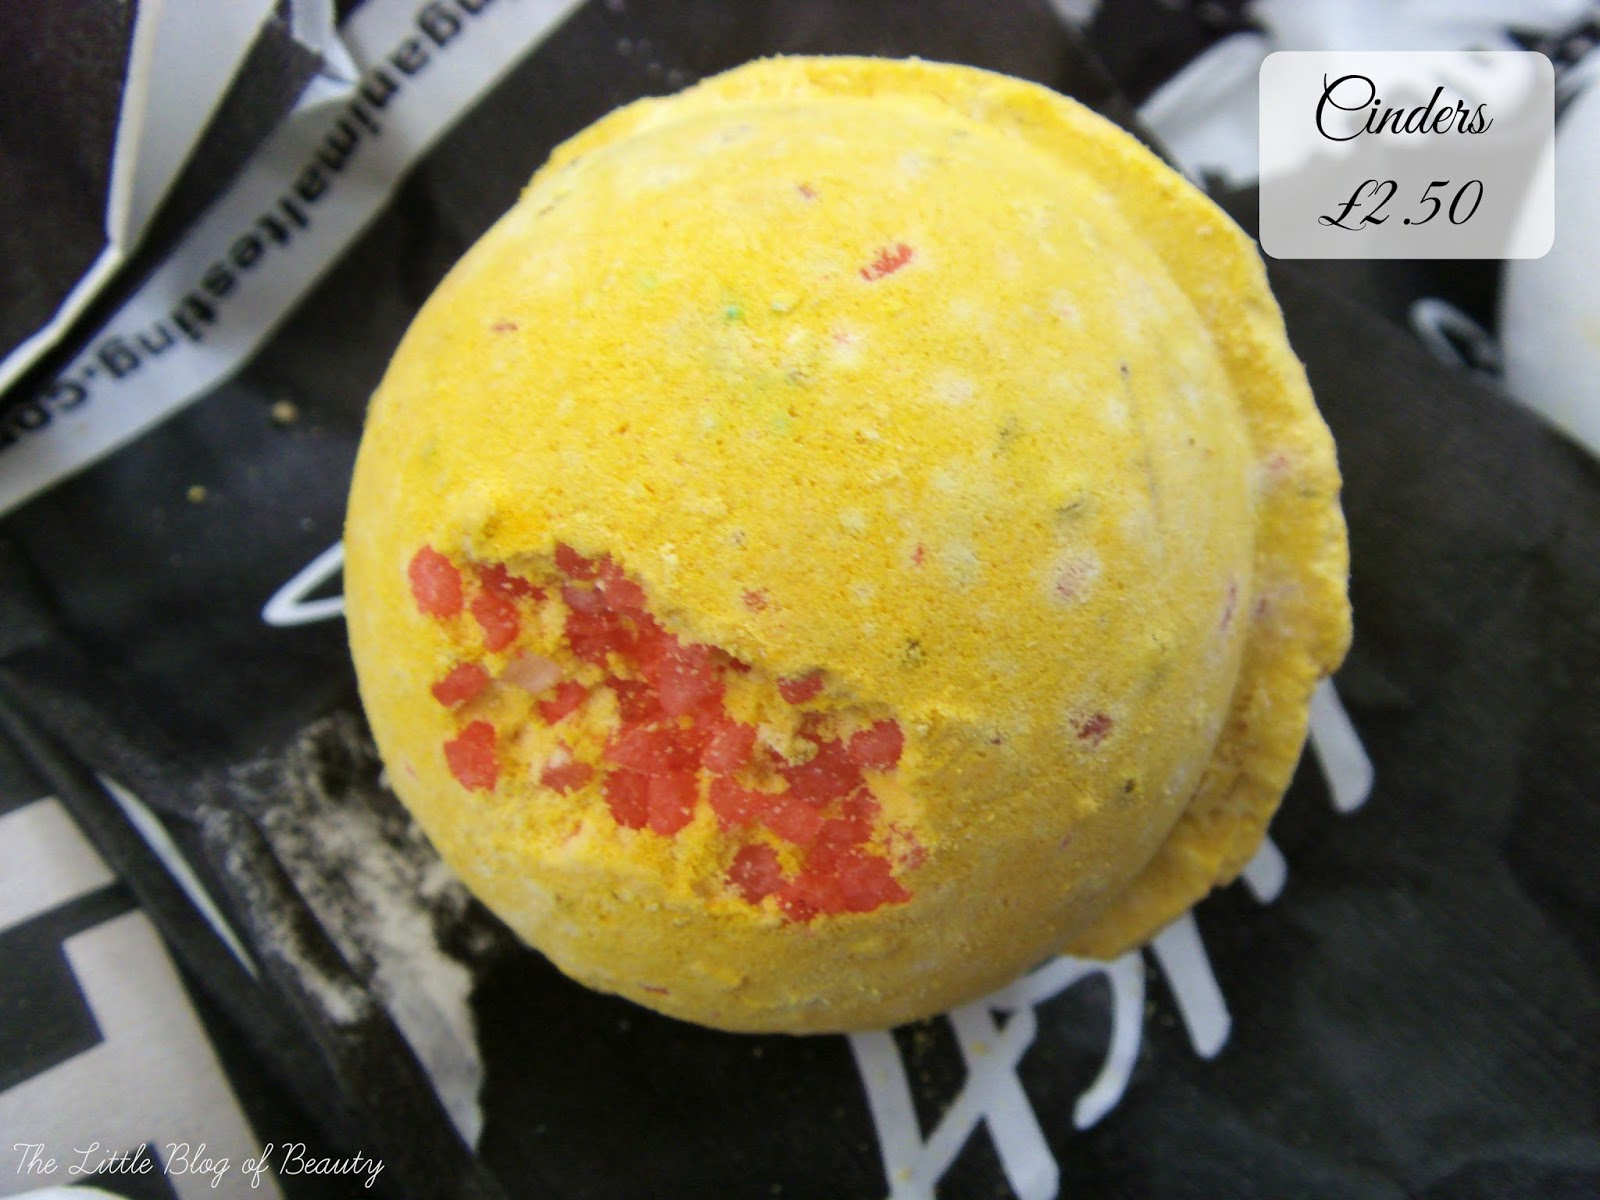 Lush Cinders bath bomb